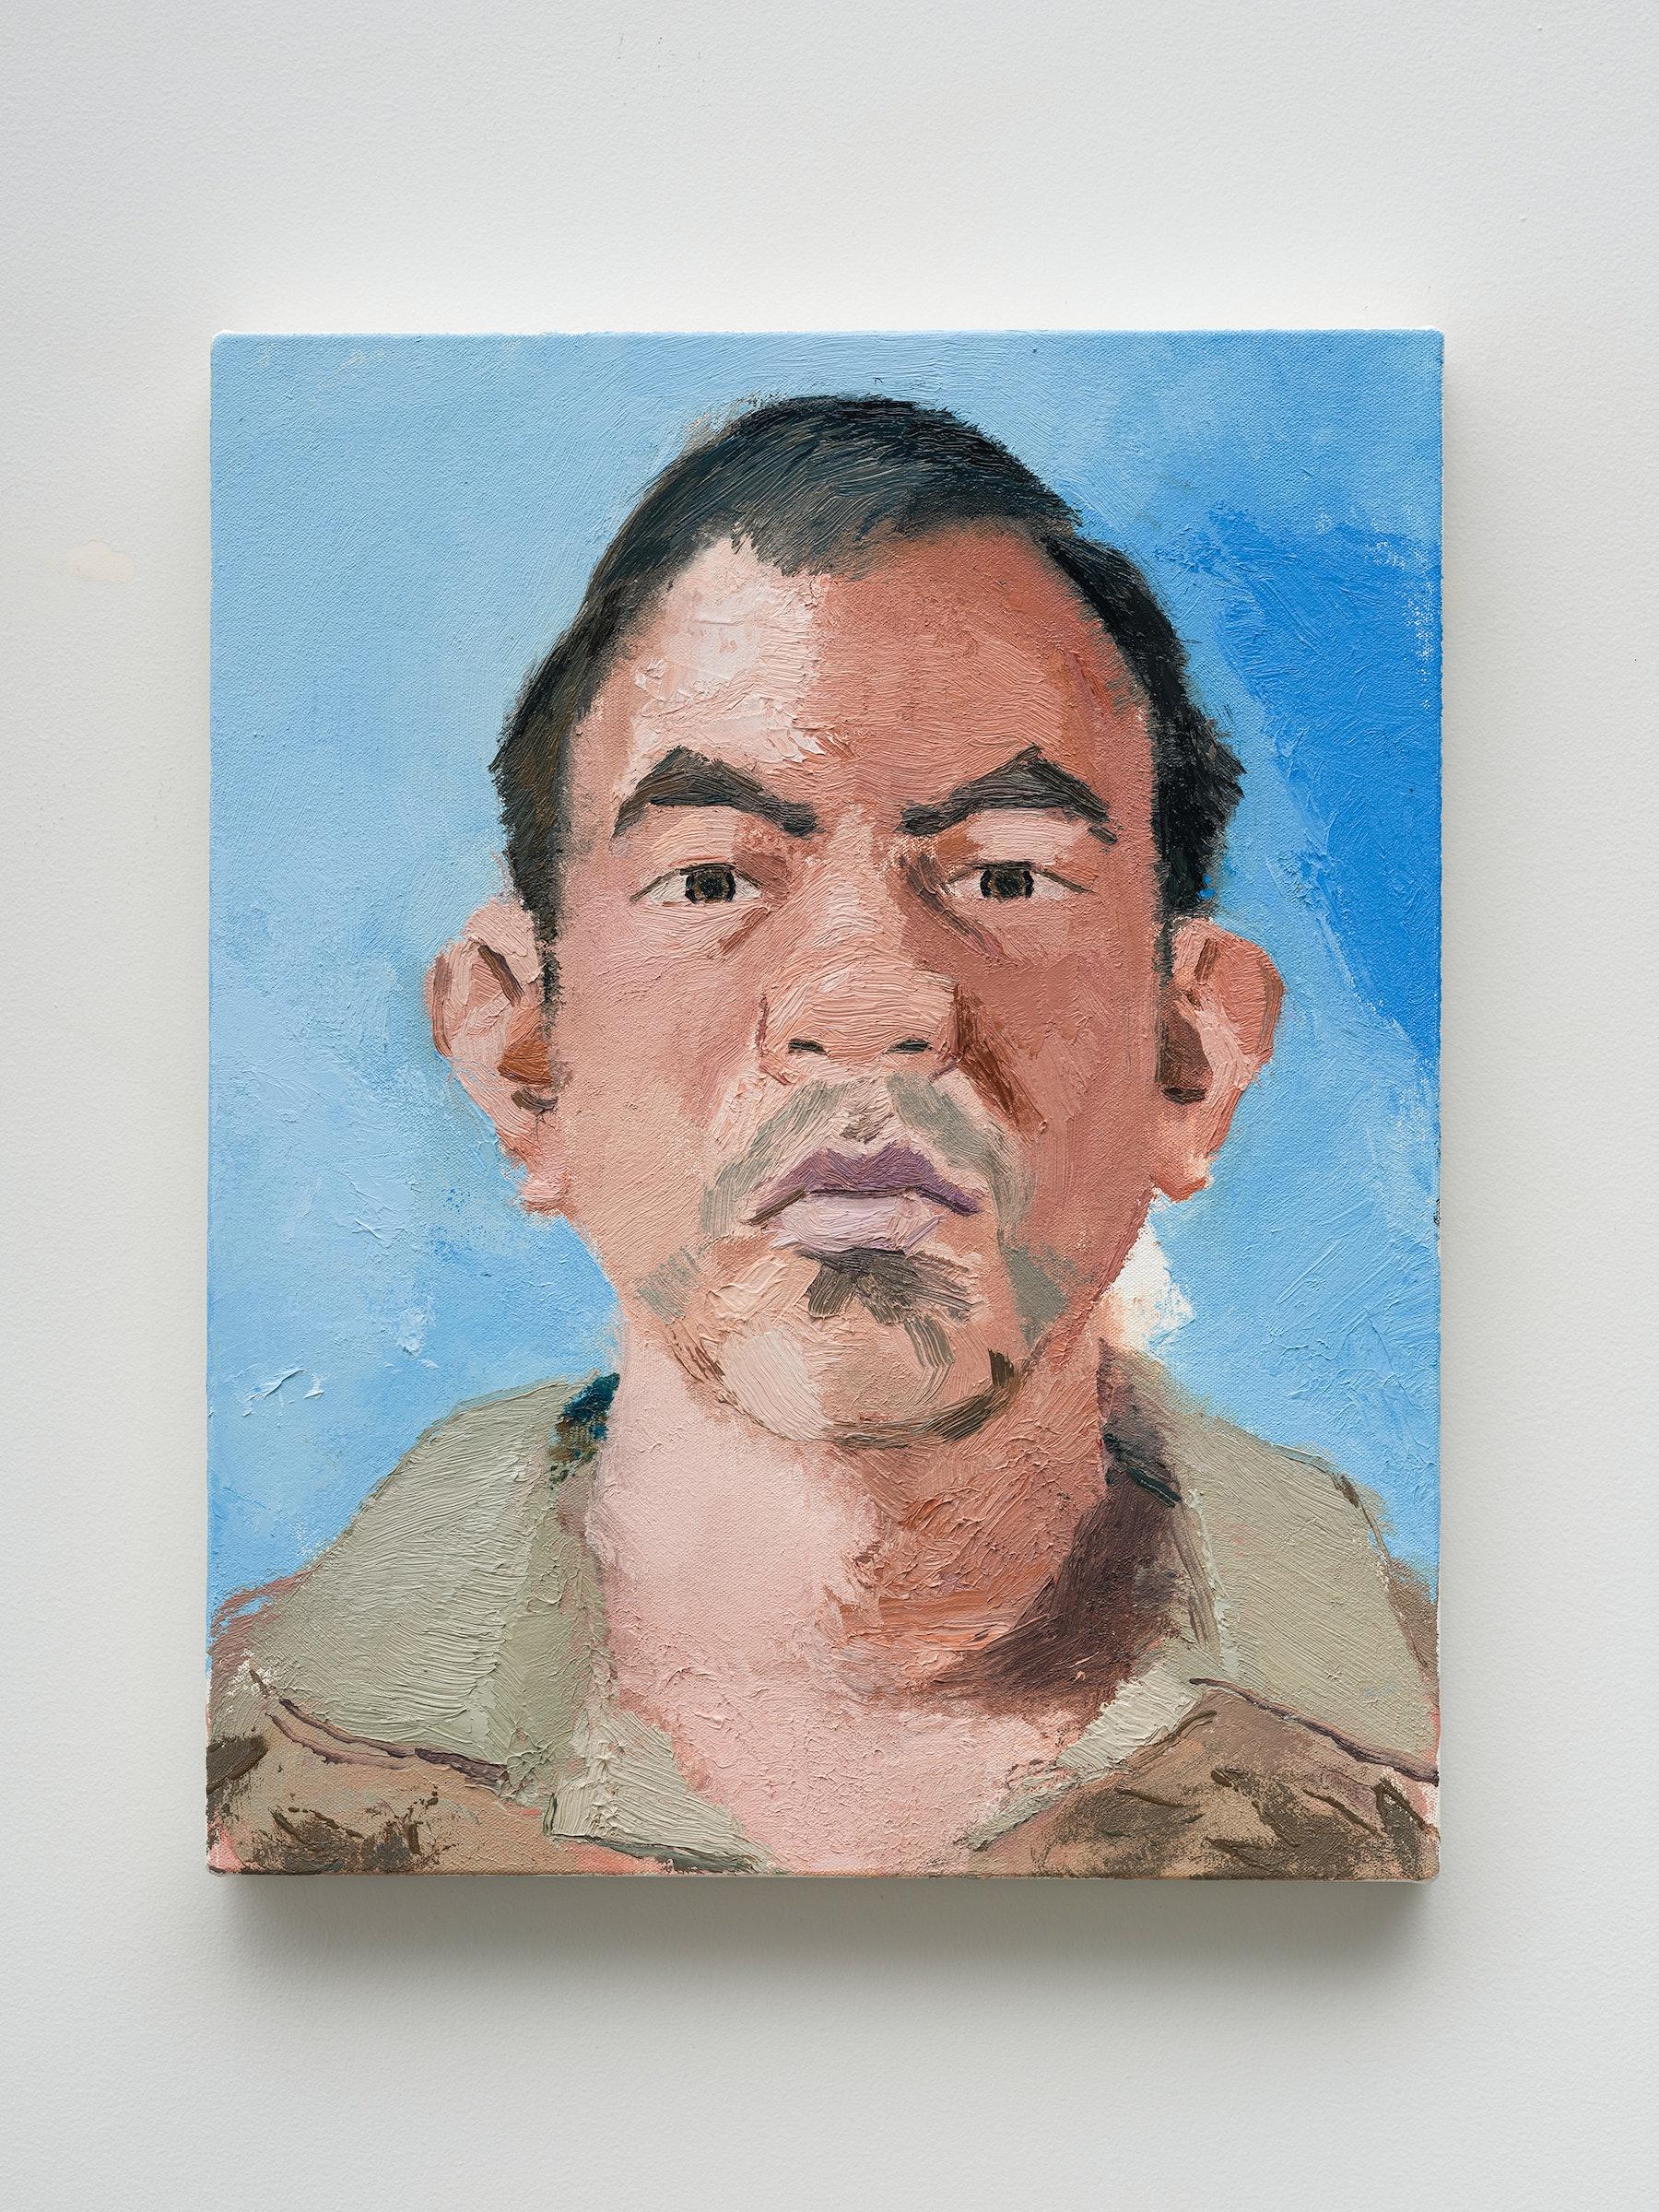 "John Sonsini ""Gabriel,"" 2021 Oil on canvas 20"" x 16"" [HxW] (50.8 x 40.64 cm) Inventory #SON130 Courtesy of the artist and Vielmetter Los Angeles Photo credit: Jeff Mclane"